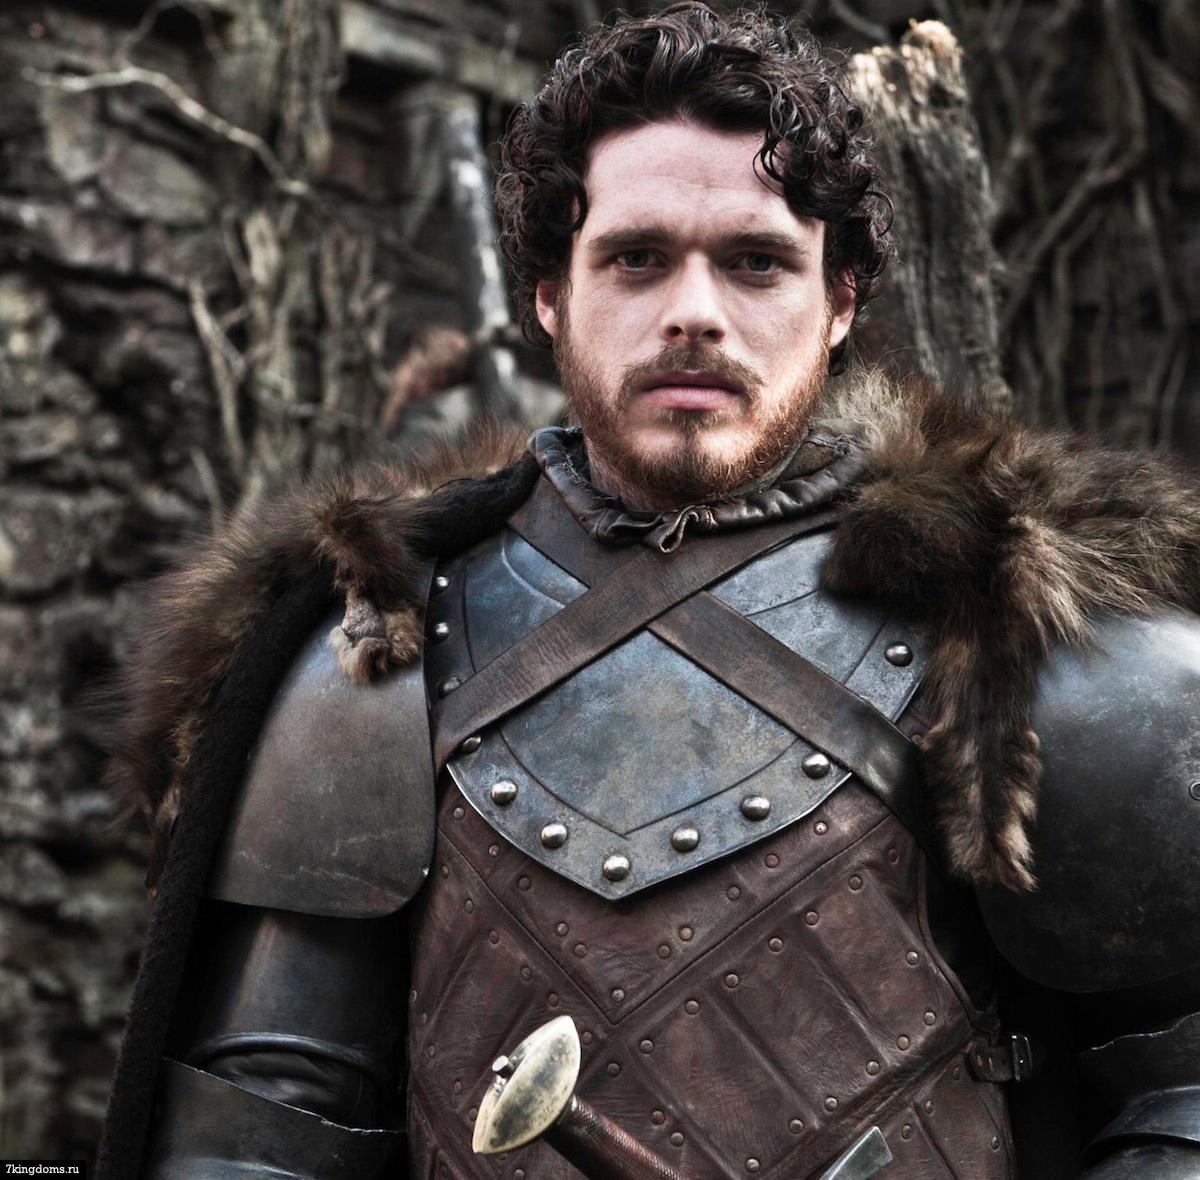 Robb Stark - Robb Stark Photo (34106840) - Fanpop